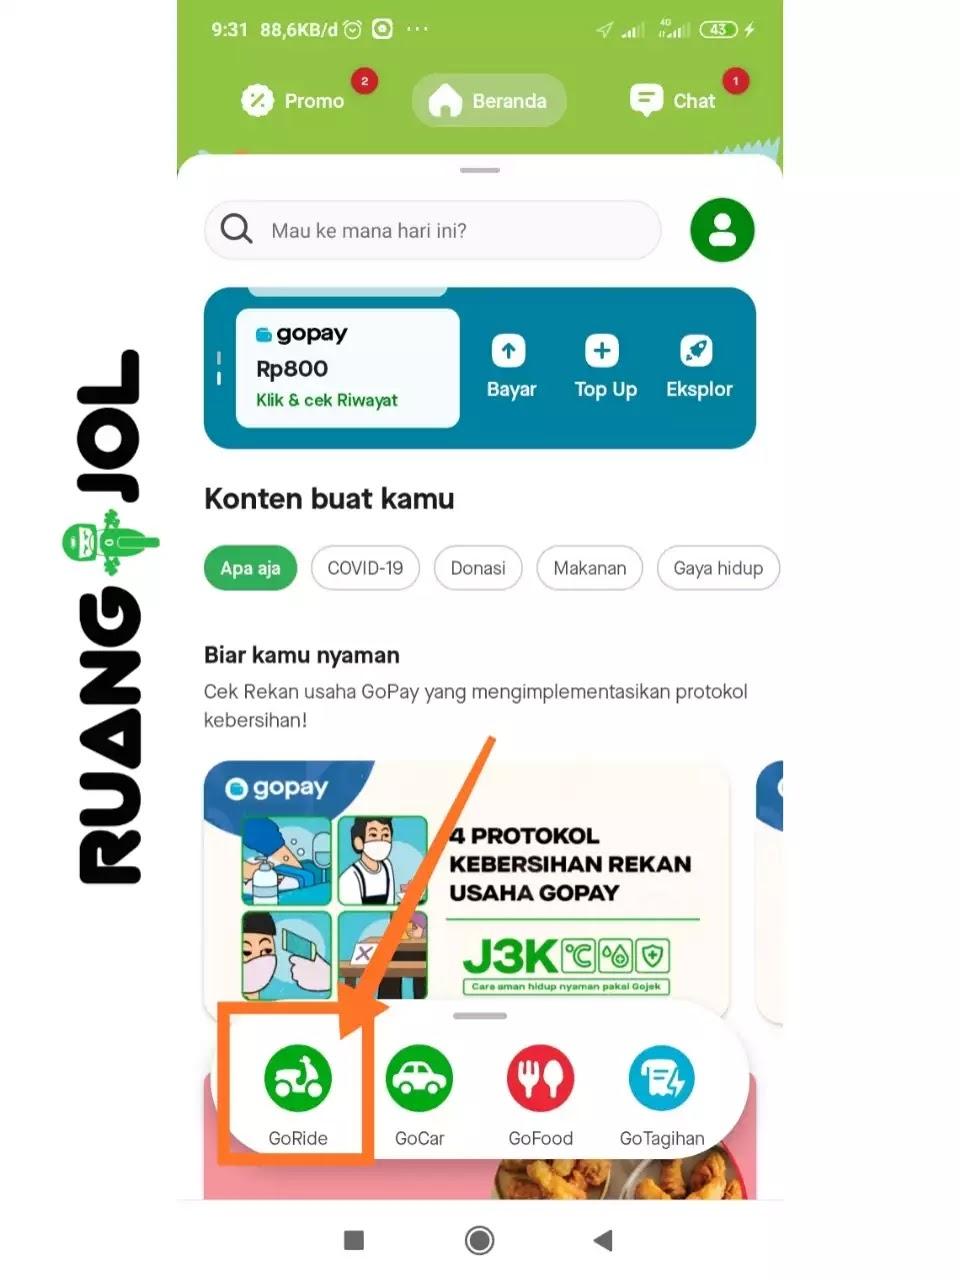 Cara Menggunakan LinkAja untuk Pembayaran di Aplikasi Gojek Customer